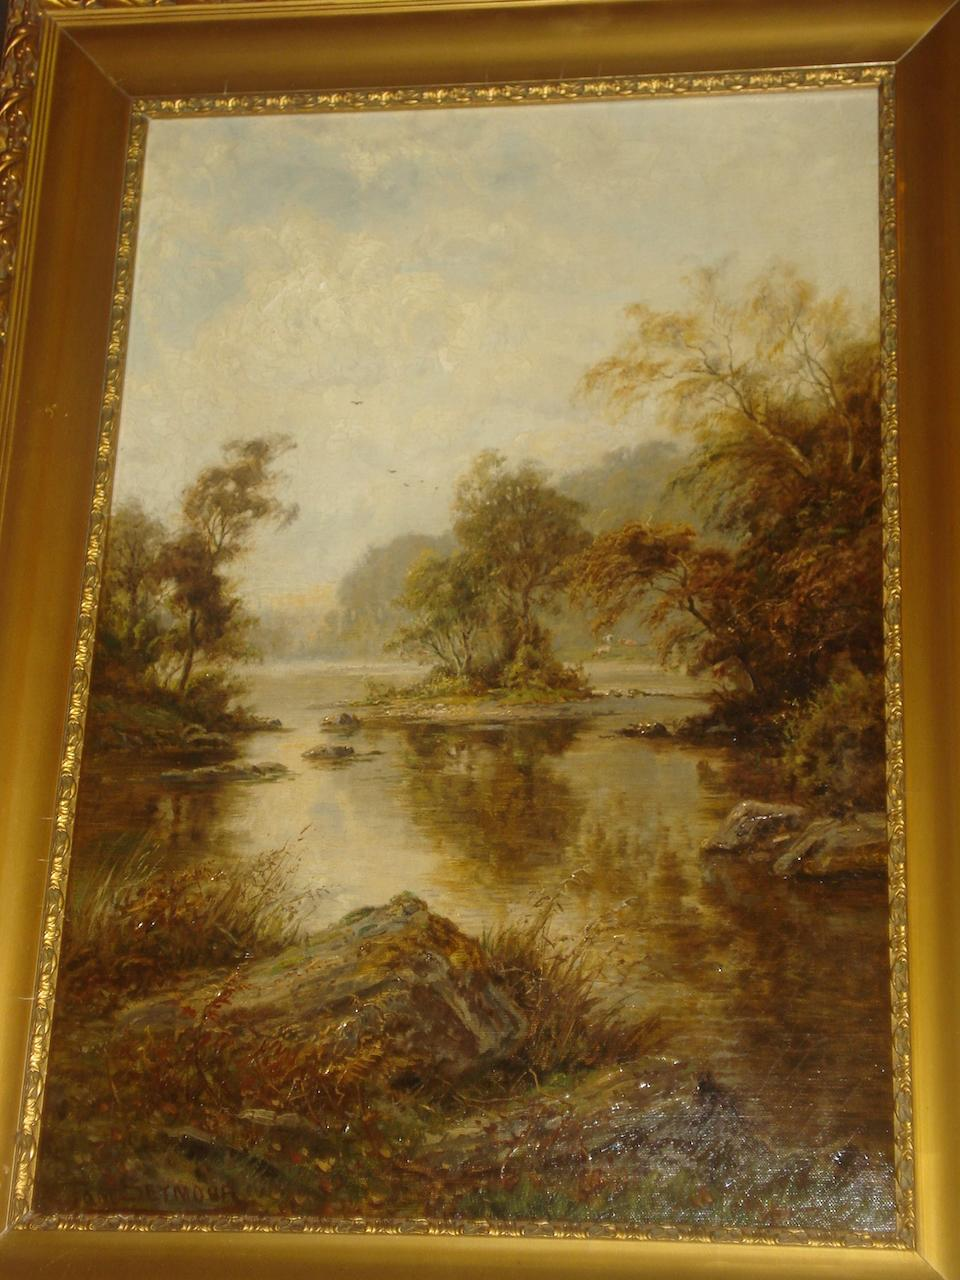 Tom Seymour (British) 'On the Wharfe', a pair